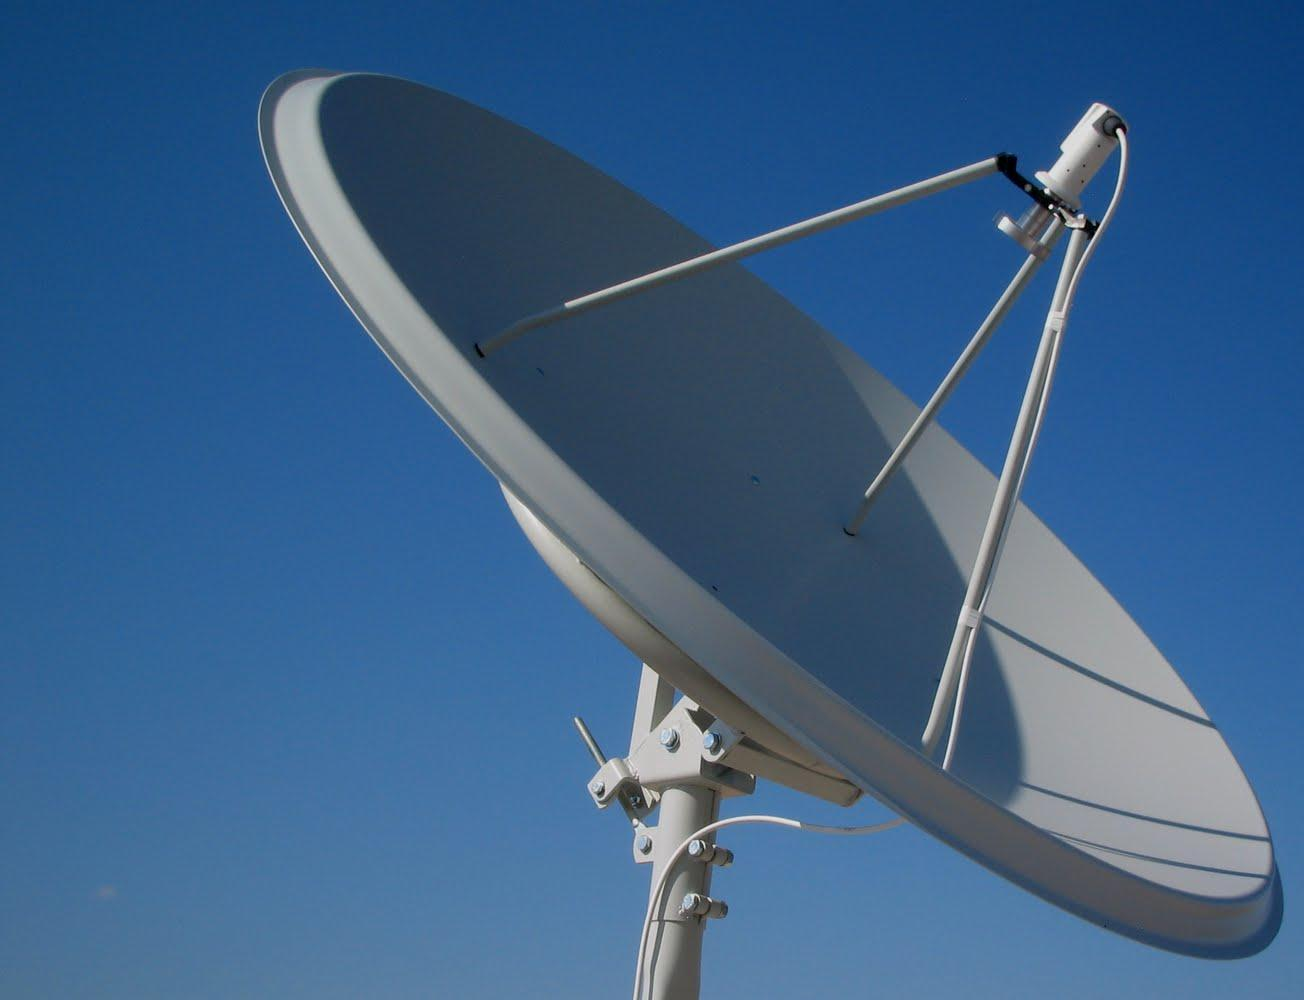 accesskeyidfbb1d739335a1982a3f9disposition0alloworigin1 sky tv cardshtml sky satellite engineer sample resume sky satellite engineer sample resume - Satellite Engineer Sample Resume